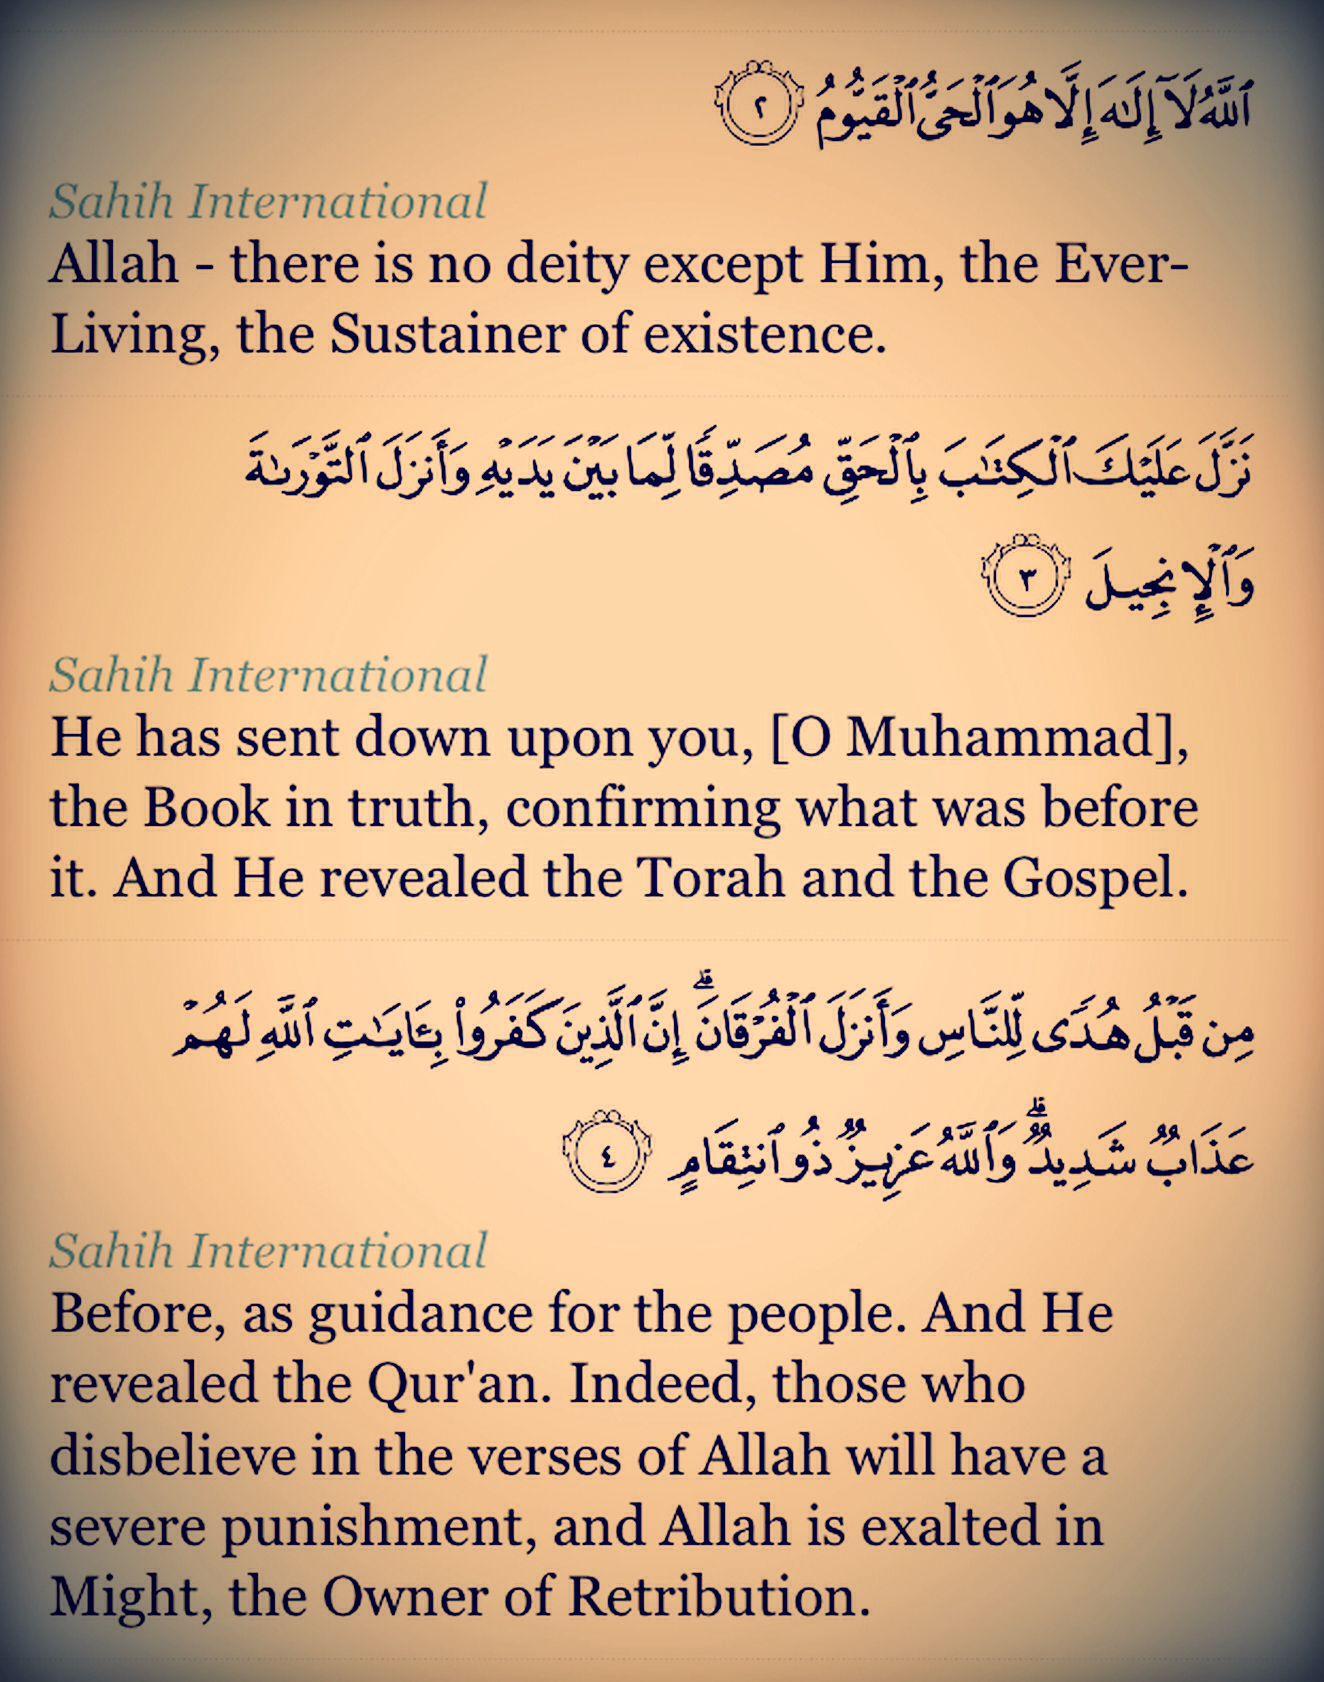 Gospel in Islam